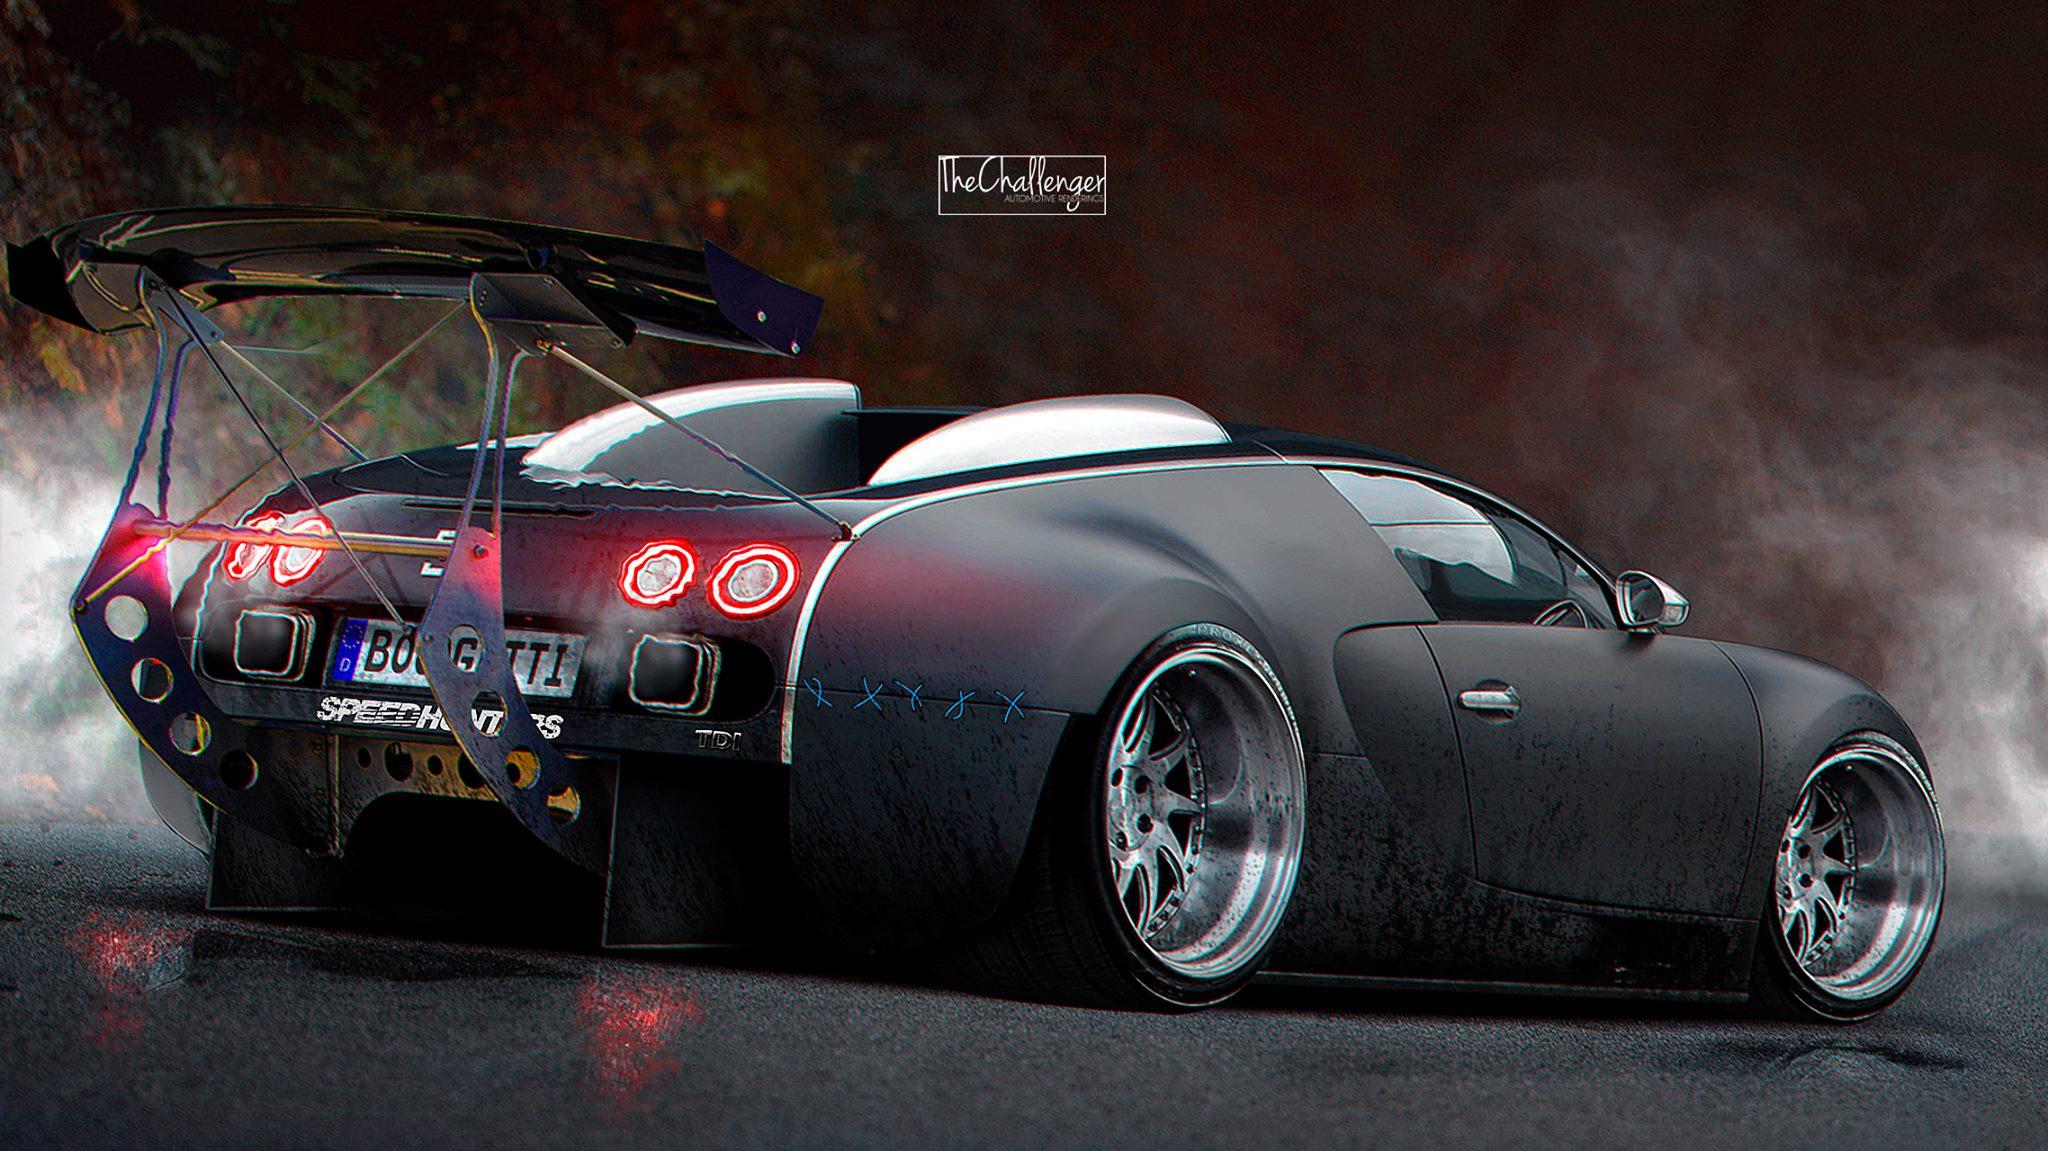 Wallpaper Hd Ducati Bugatti Veyron Gets Stanced Luckily It S A Rendering